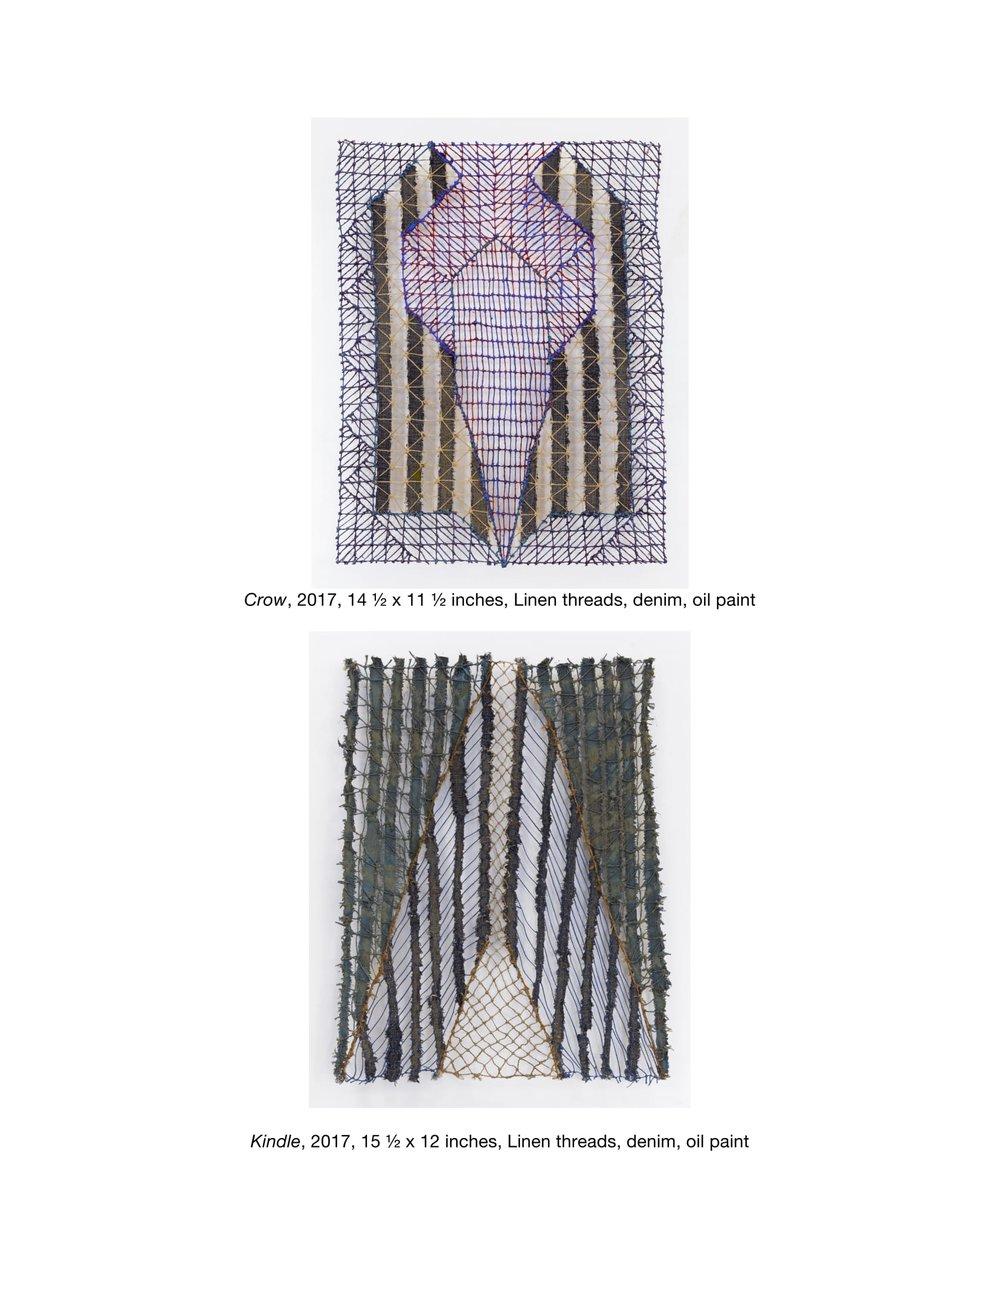 Julia Bland Checklist-5.jpg